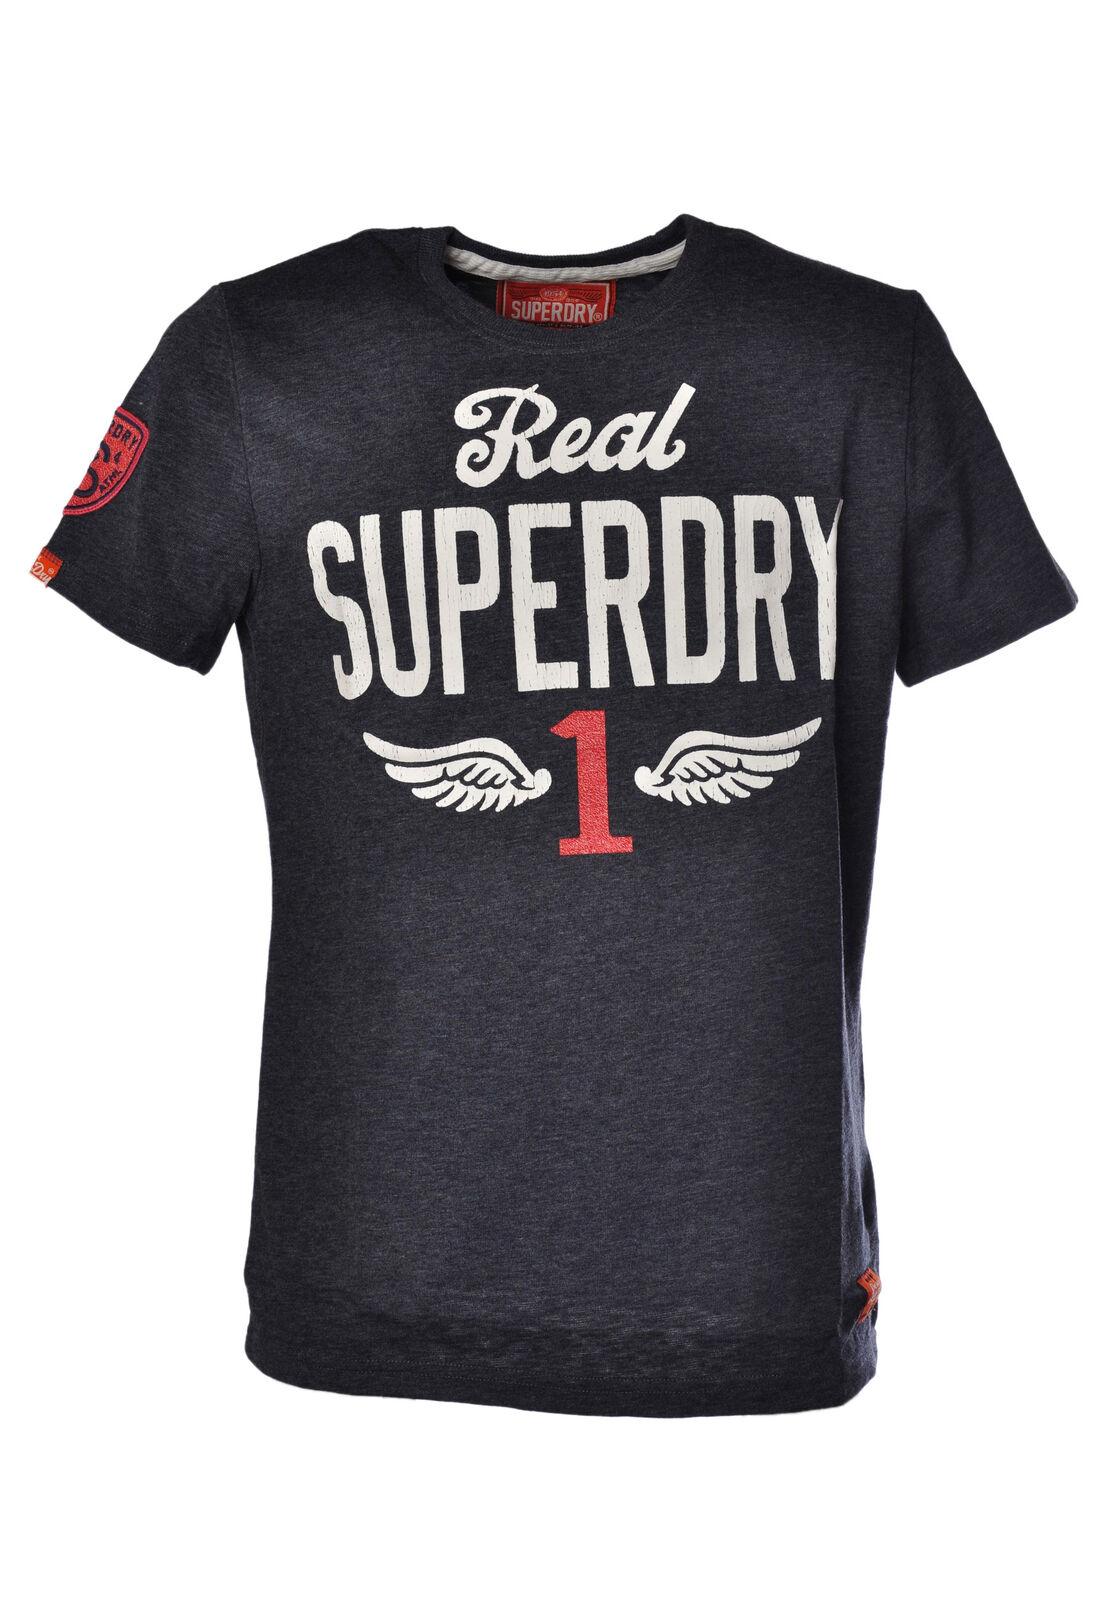 Superdry - Topwear-T-shirts - Man - bluee - 1035018C184510